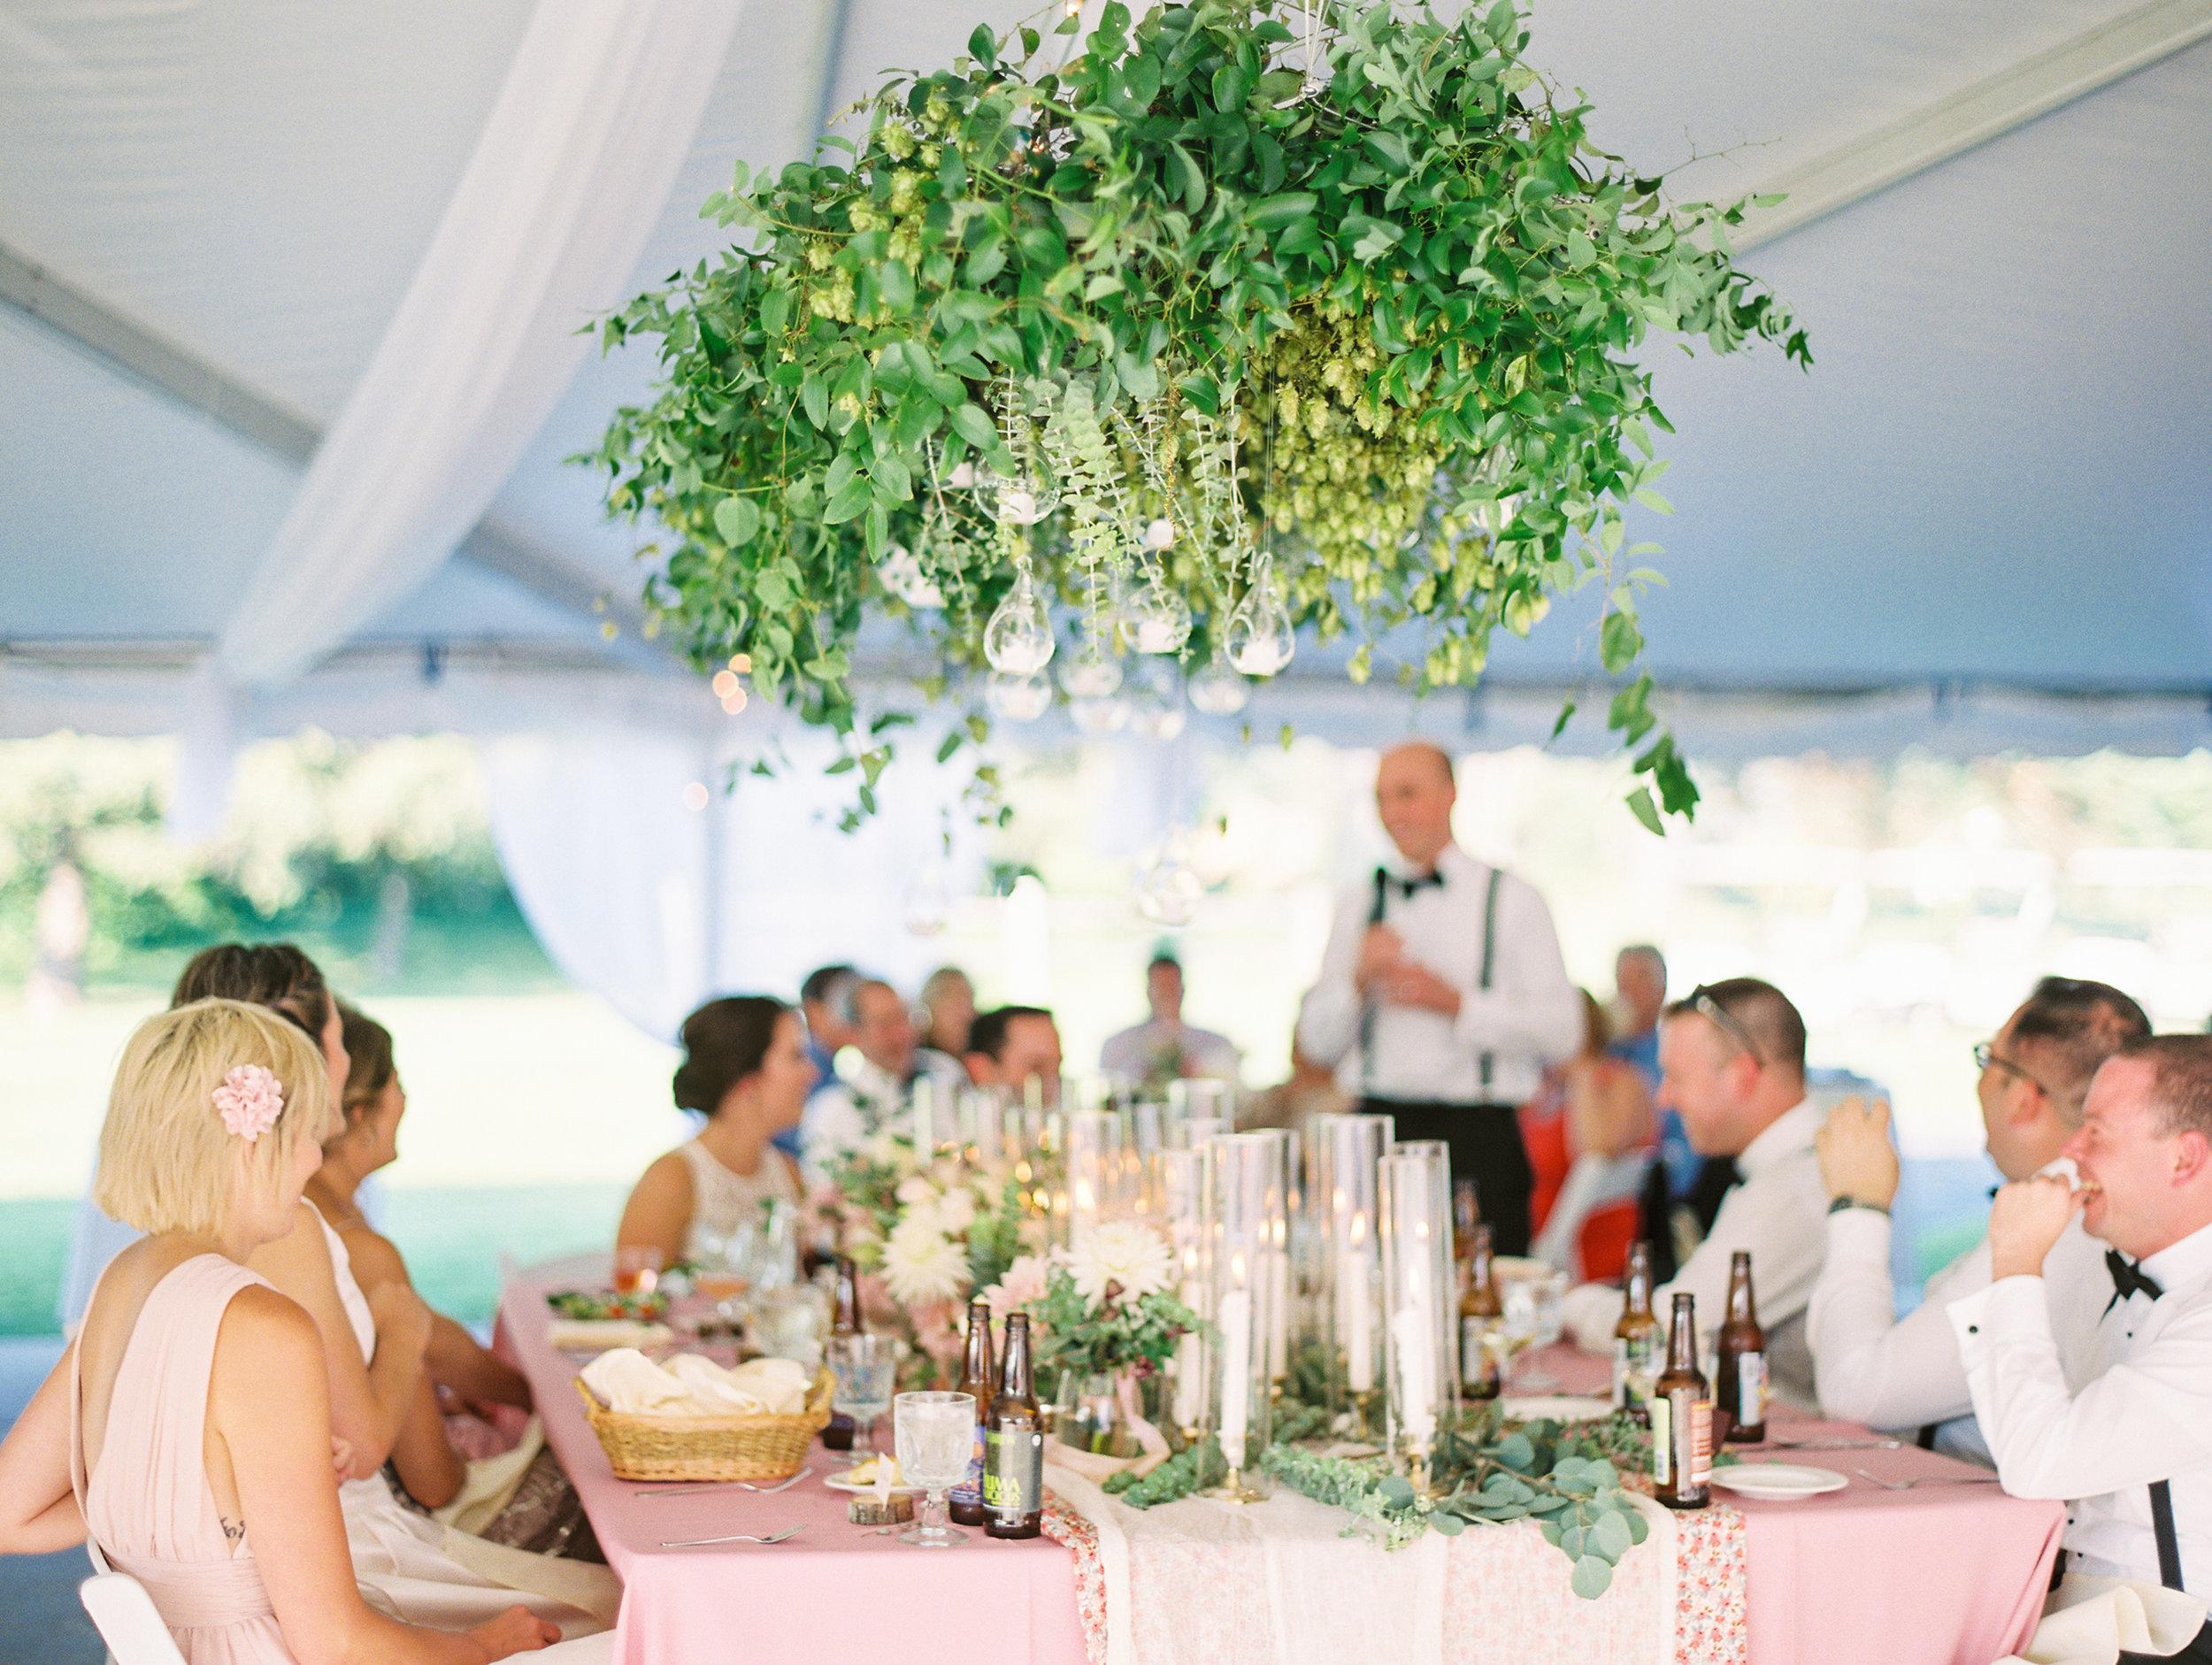 Zoller+Wedding+Reception+Toasts-97.jpg